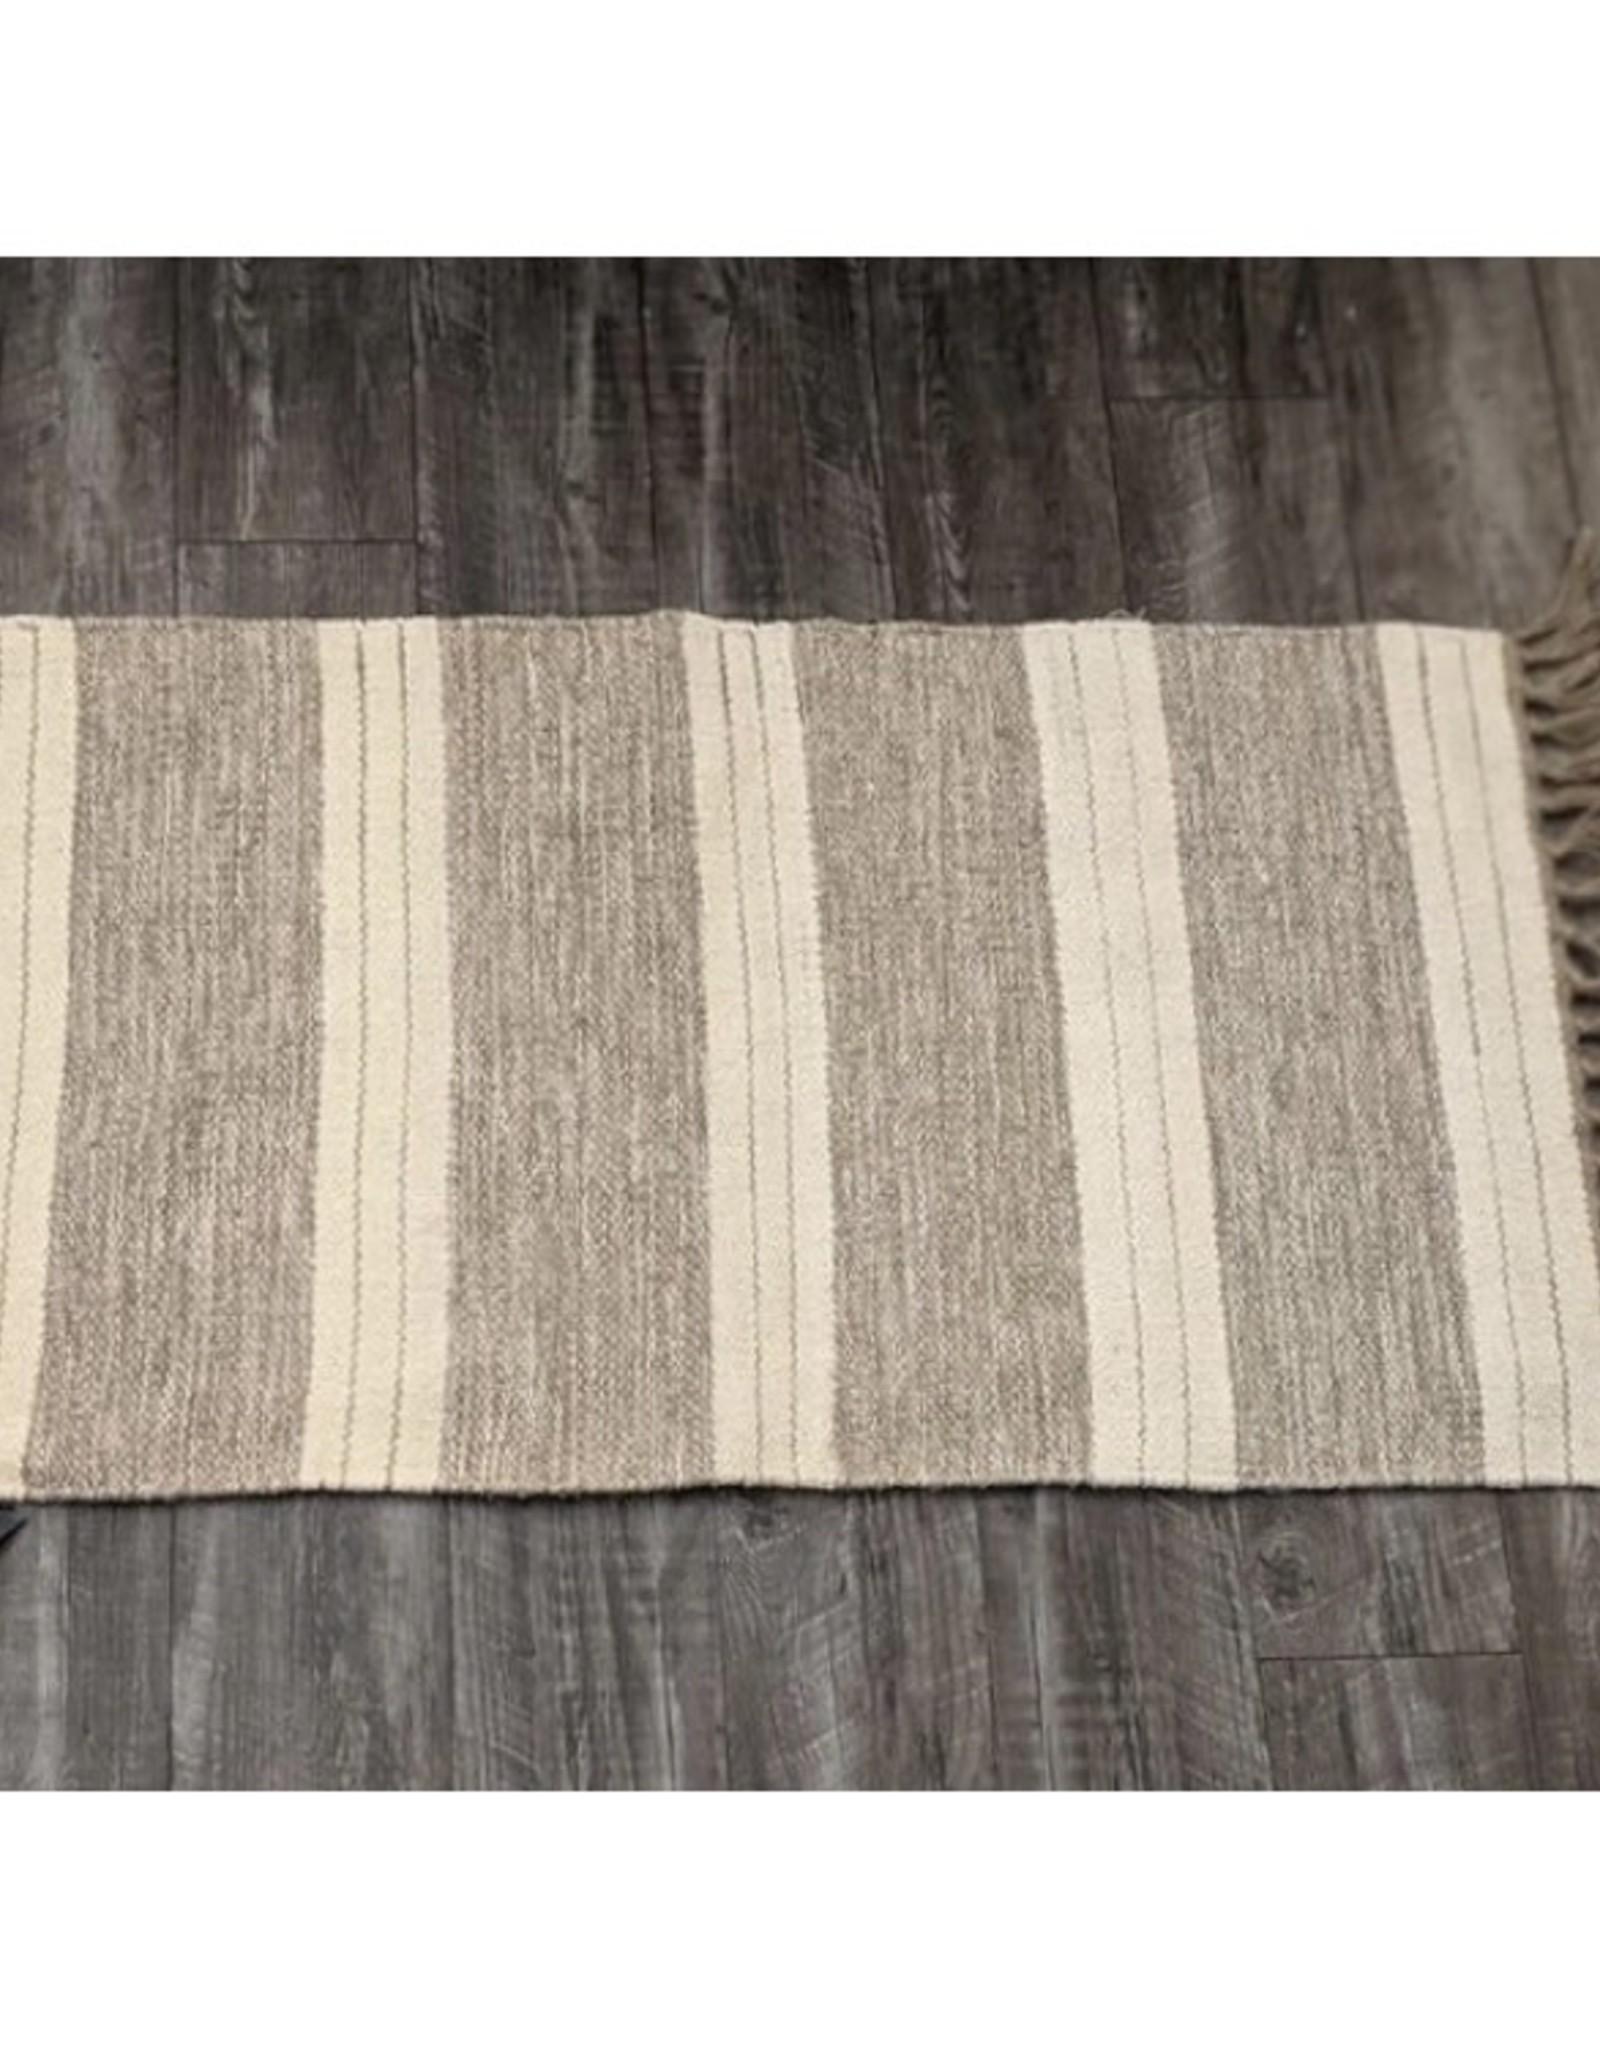 Rugs RichCasa Jute & Cotton Natural 4260 2 x 3